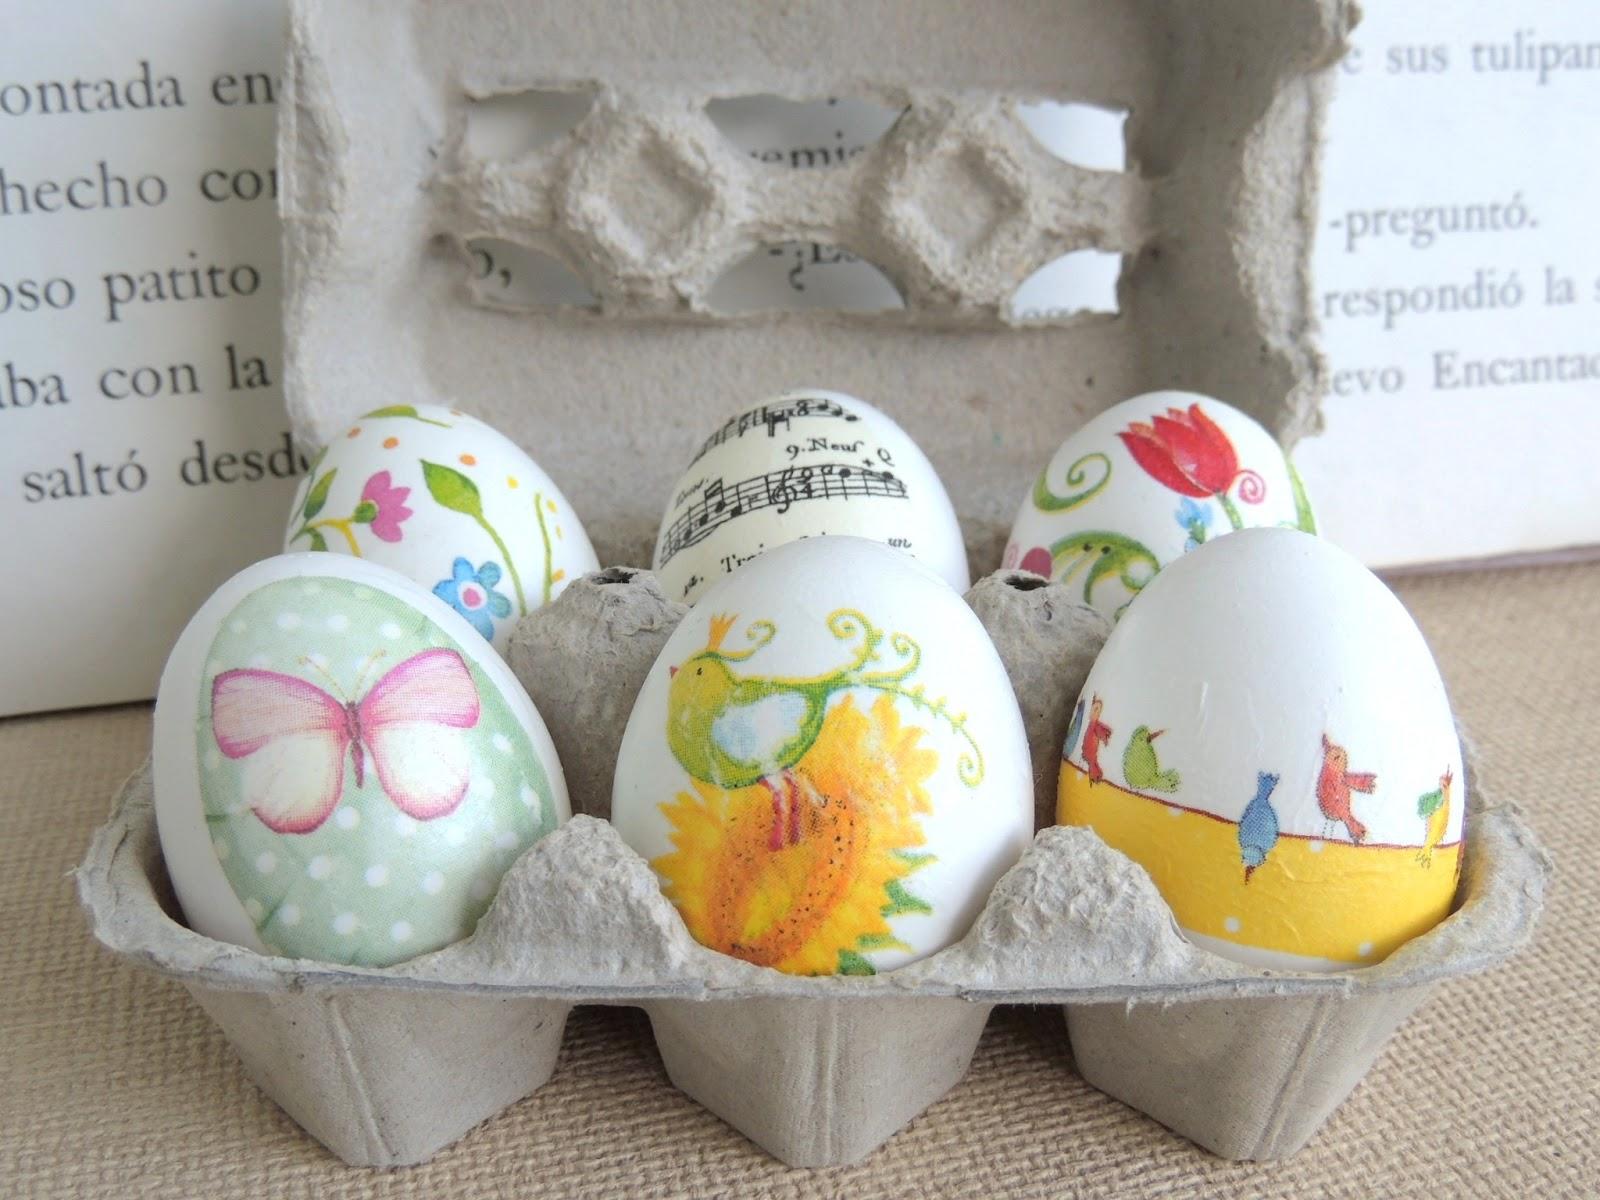 Tazas cuentos huevos de pascua y decoupage easter for Decoracion de pascua